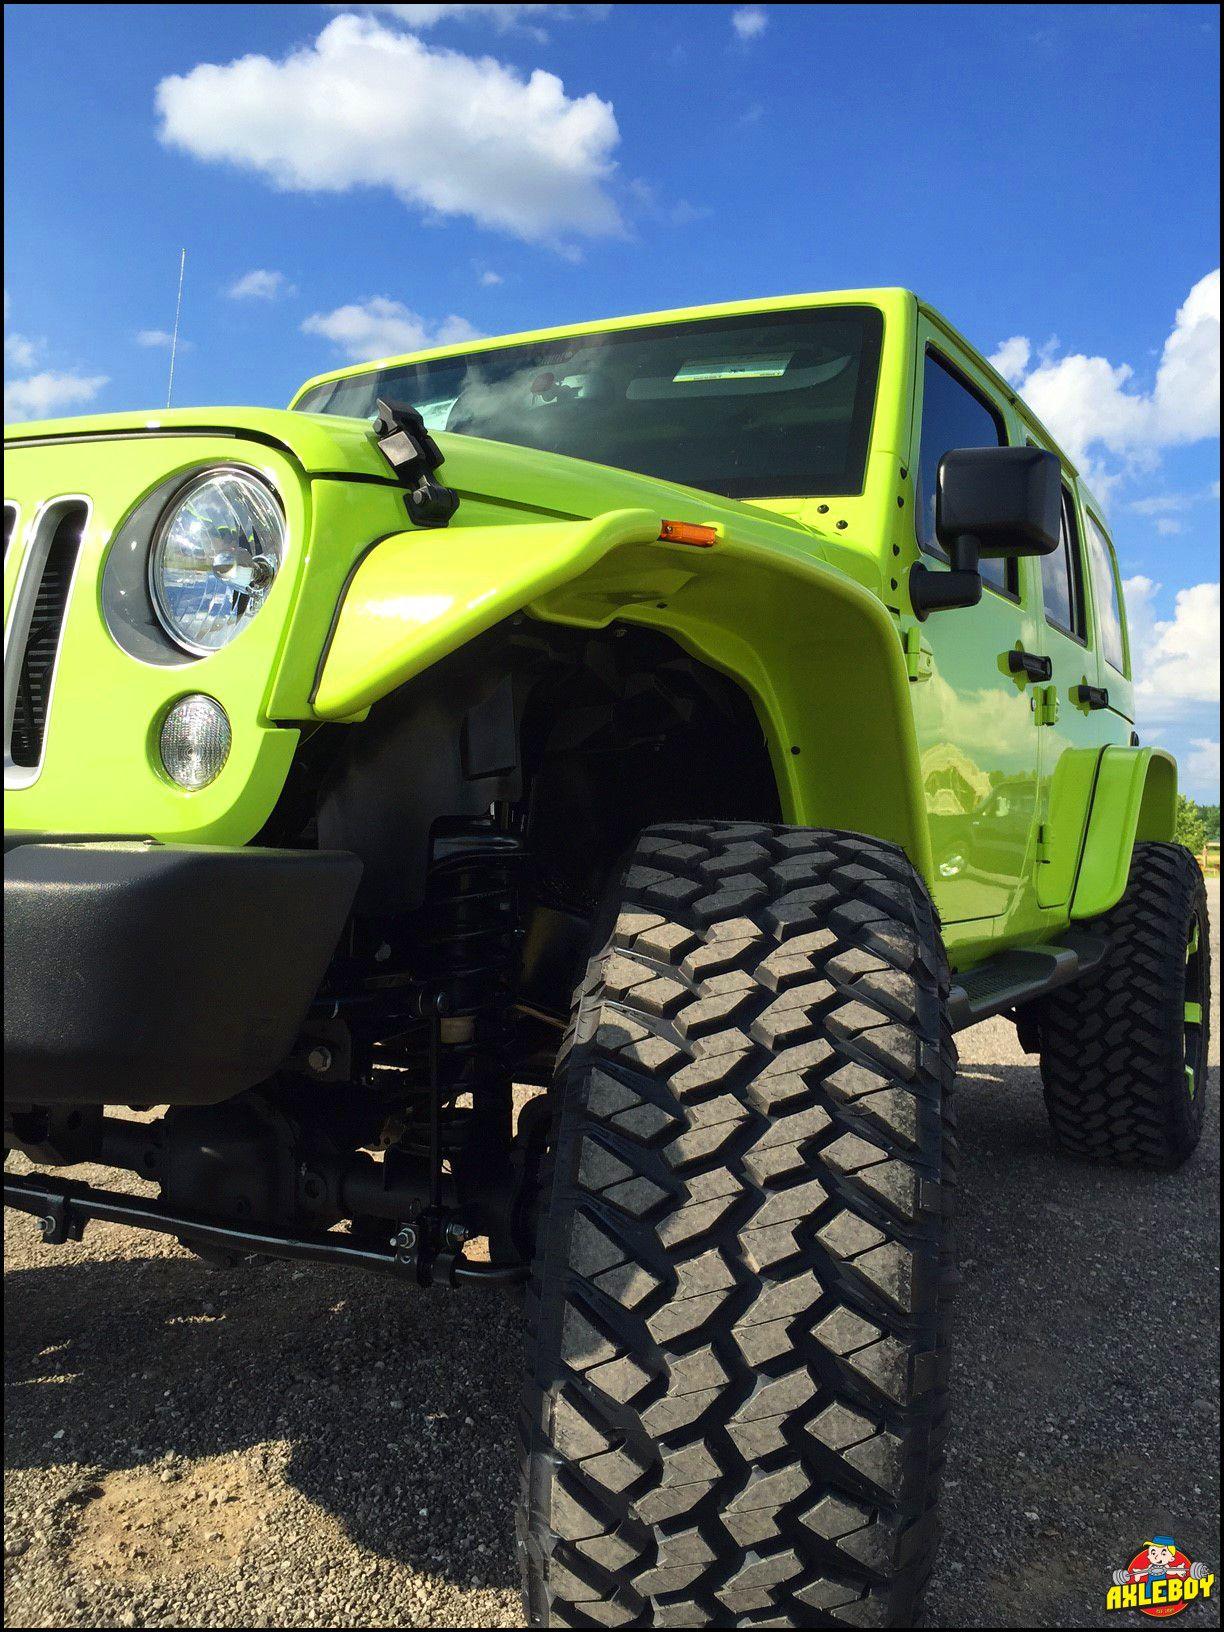 Hyper Green 2016 Jeep Wrangler On A 3 Teraflex Lift 37 Nitto Tires Stubby Front Per And Bushwacker Flat Fenders